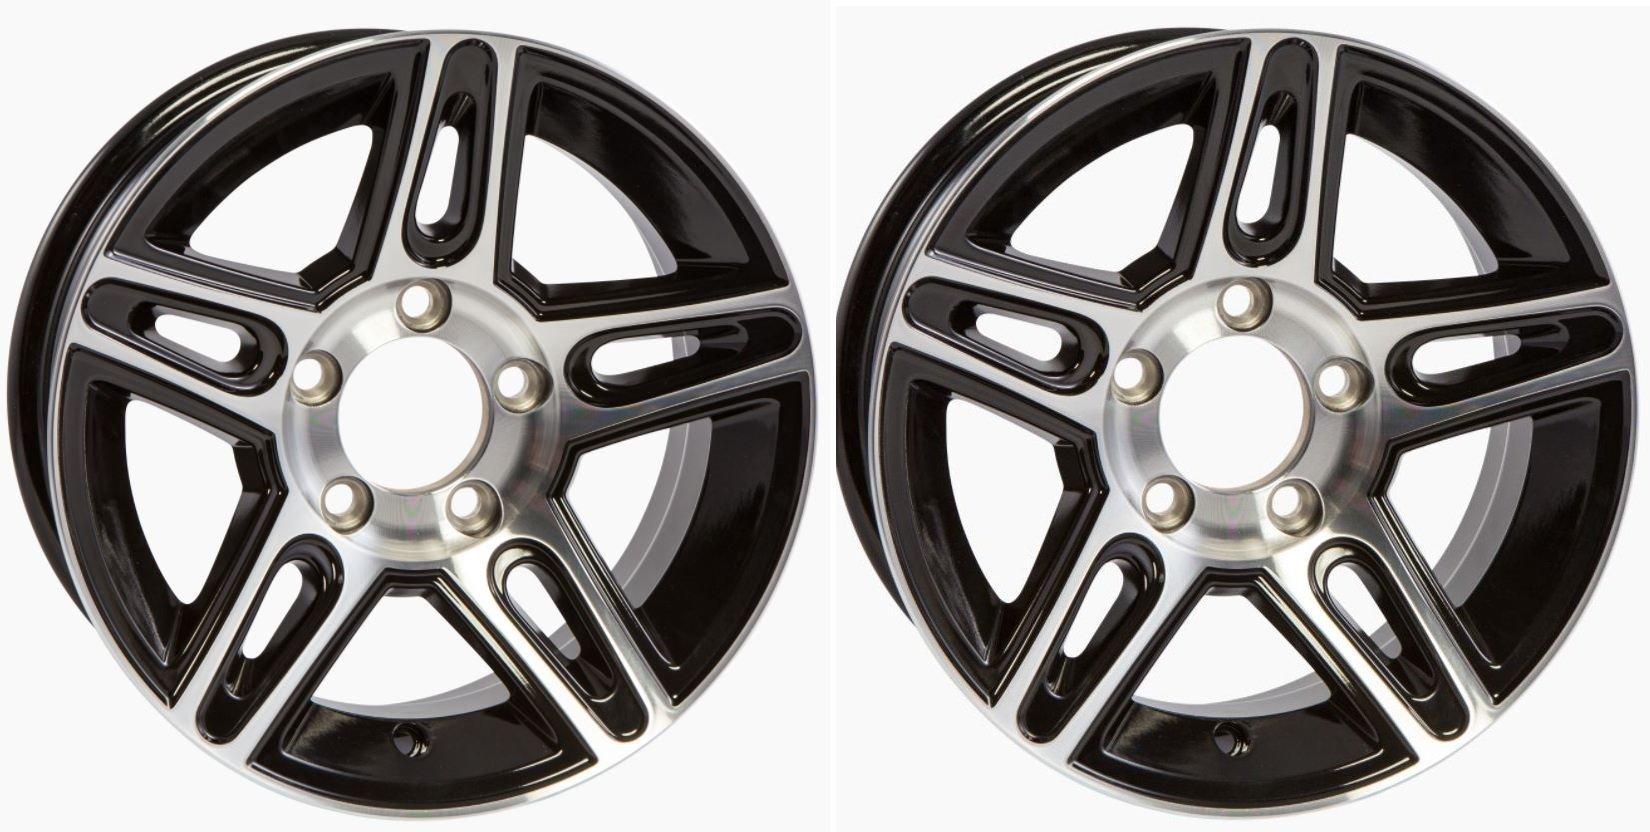 eCustomRim-2-Pack-Aluminum-Trailer-Rims-Wheels-5-Lug-13-in-Pinnacle-Black-Style